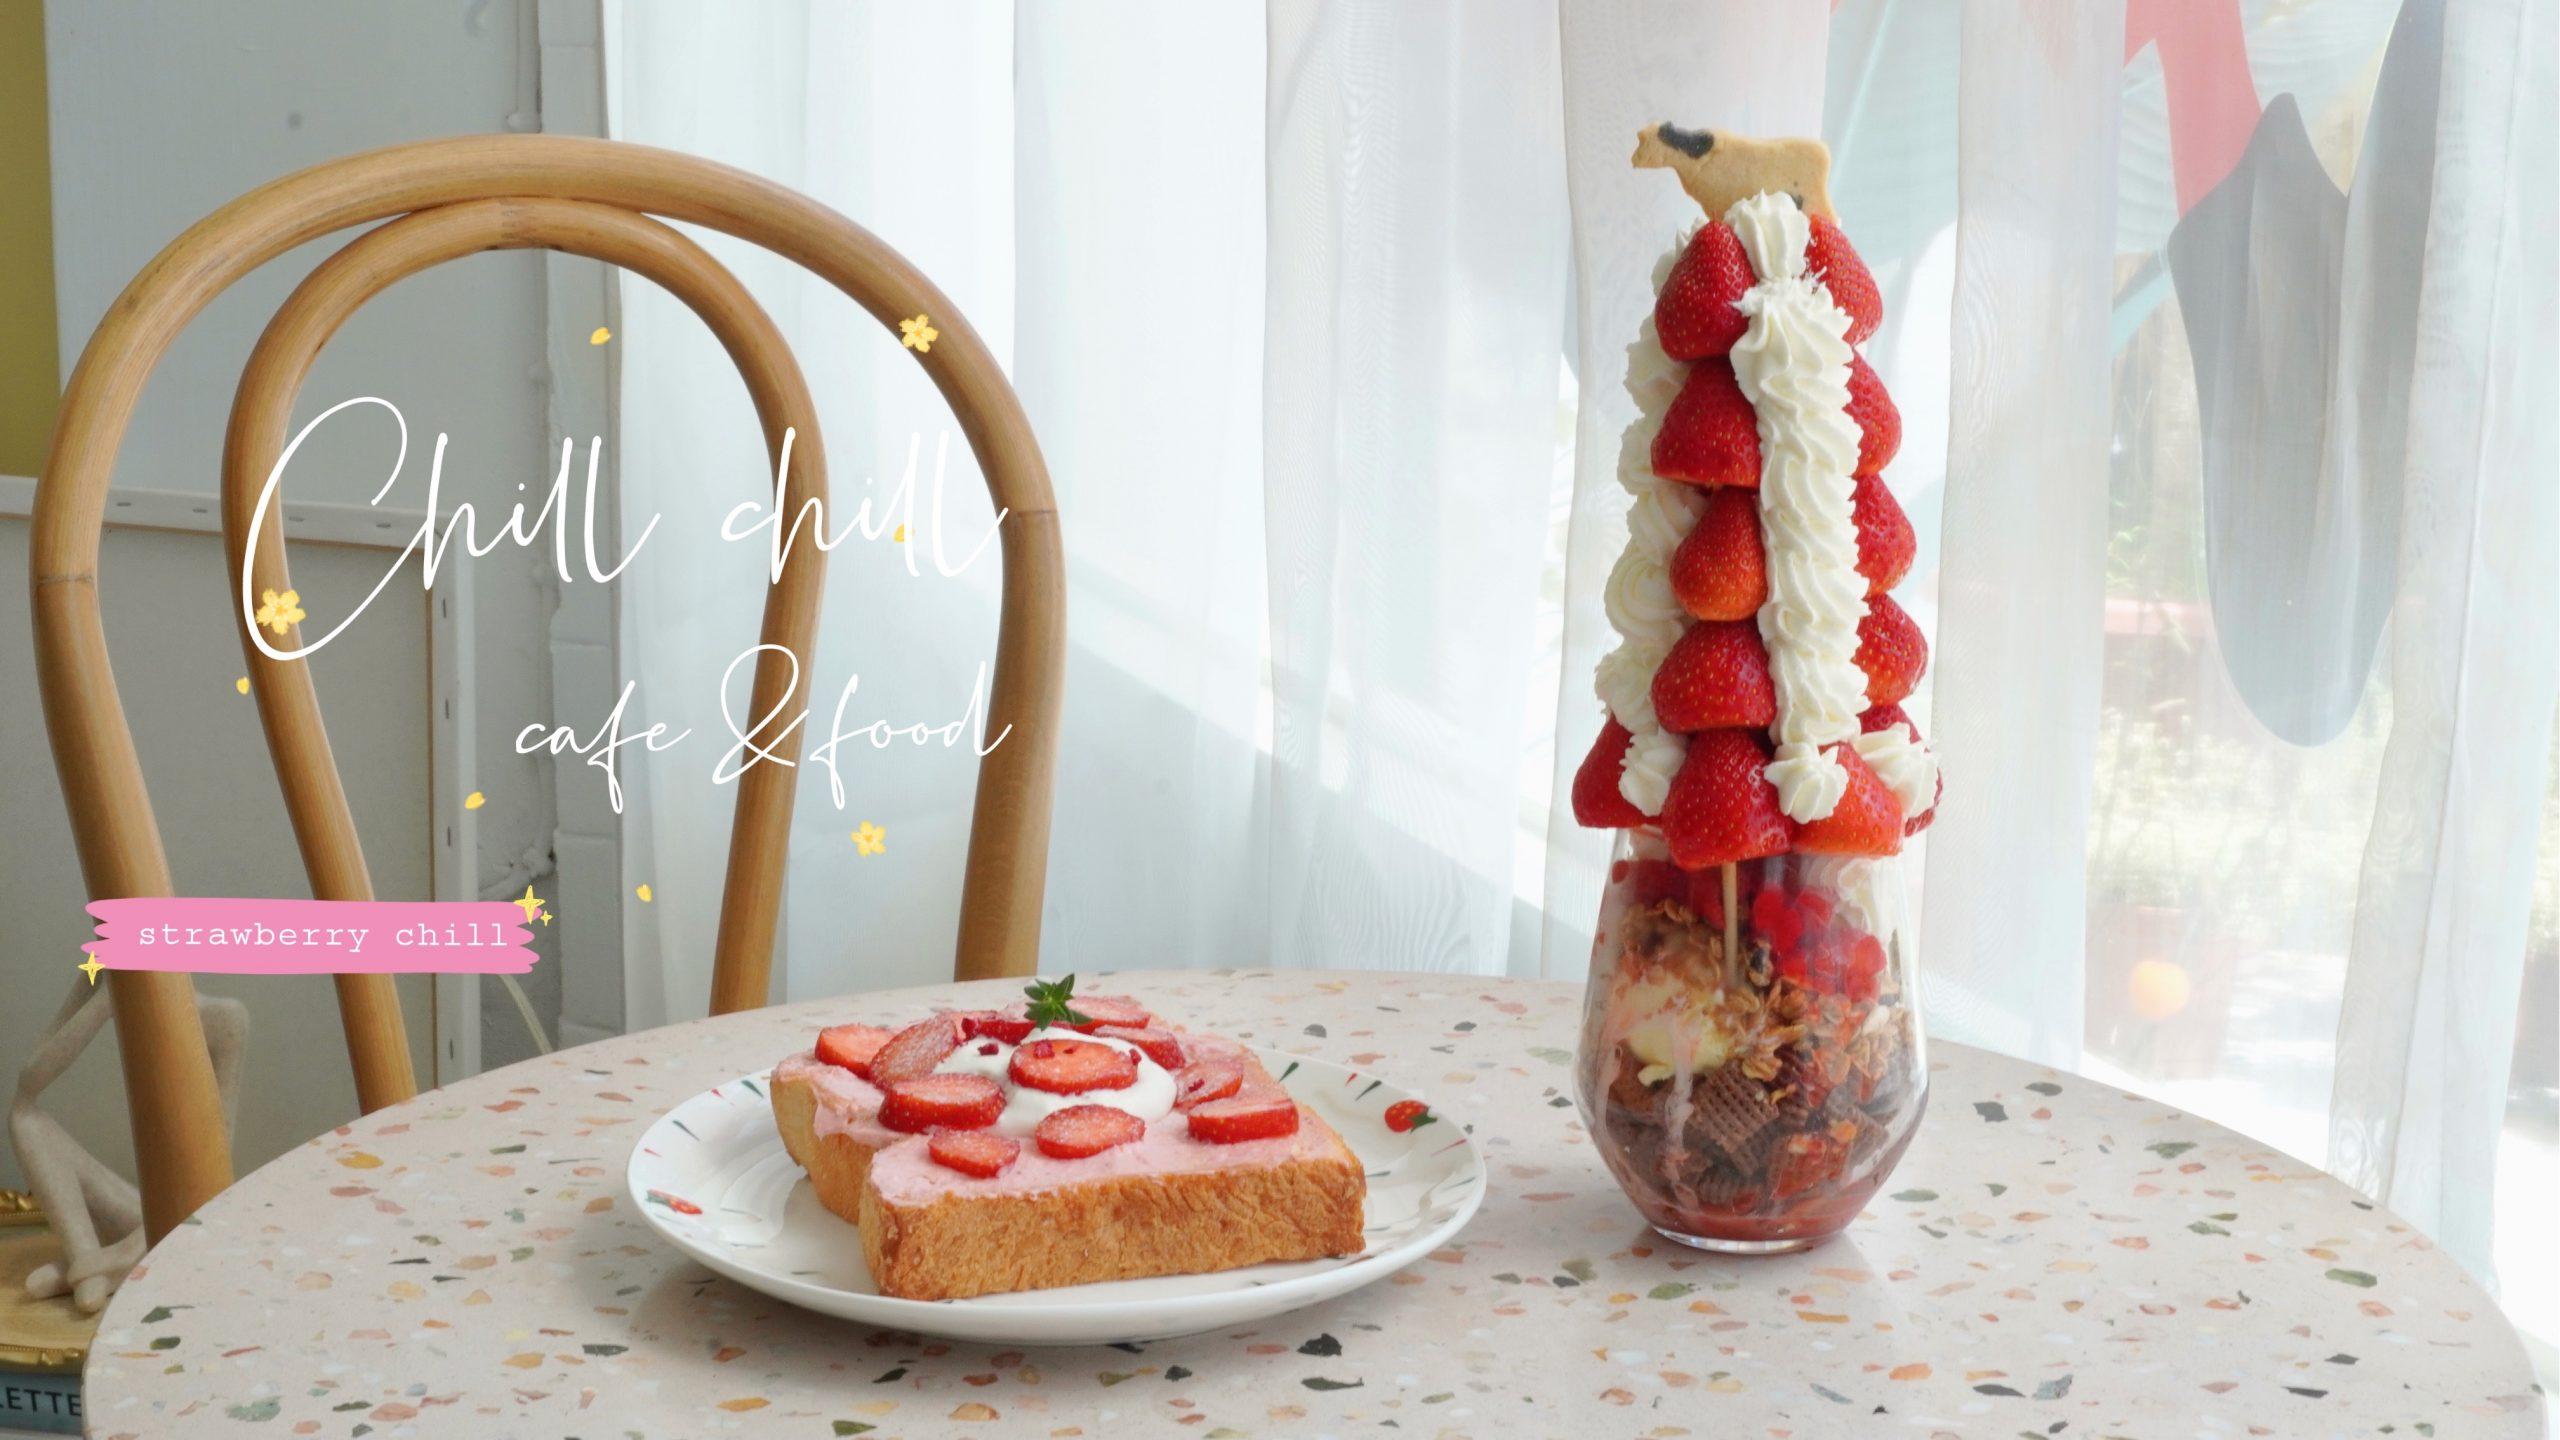 ☆【台中|美食】草莓界的101大樓!Chill Chill cafe&food限定「草莓の山 哞過山chill」 @凱的日本食尚日記